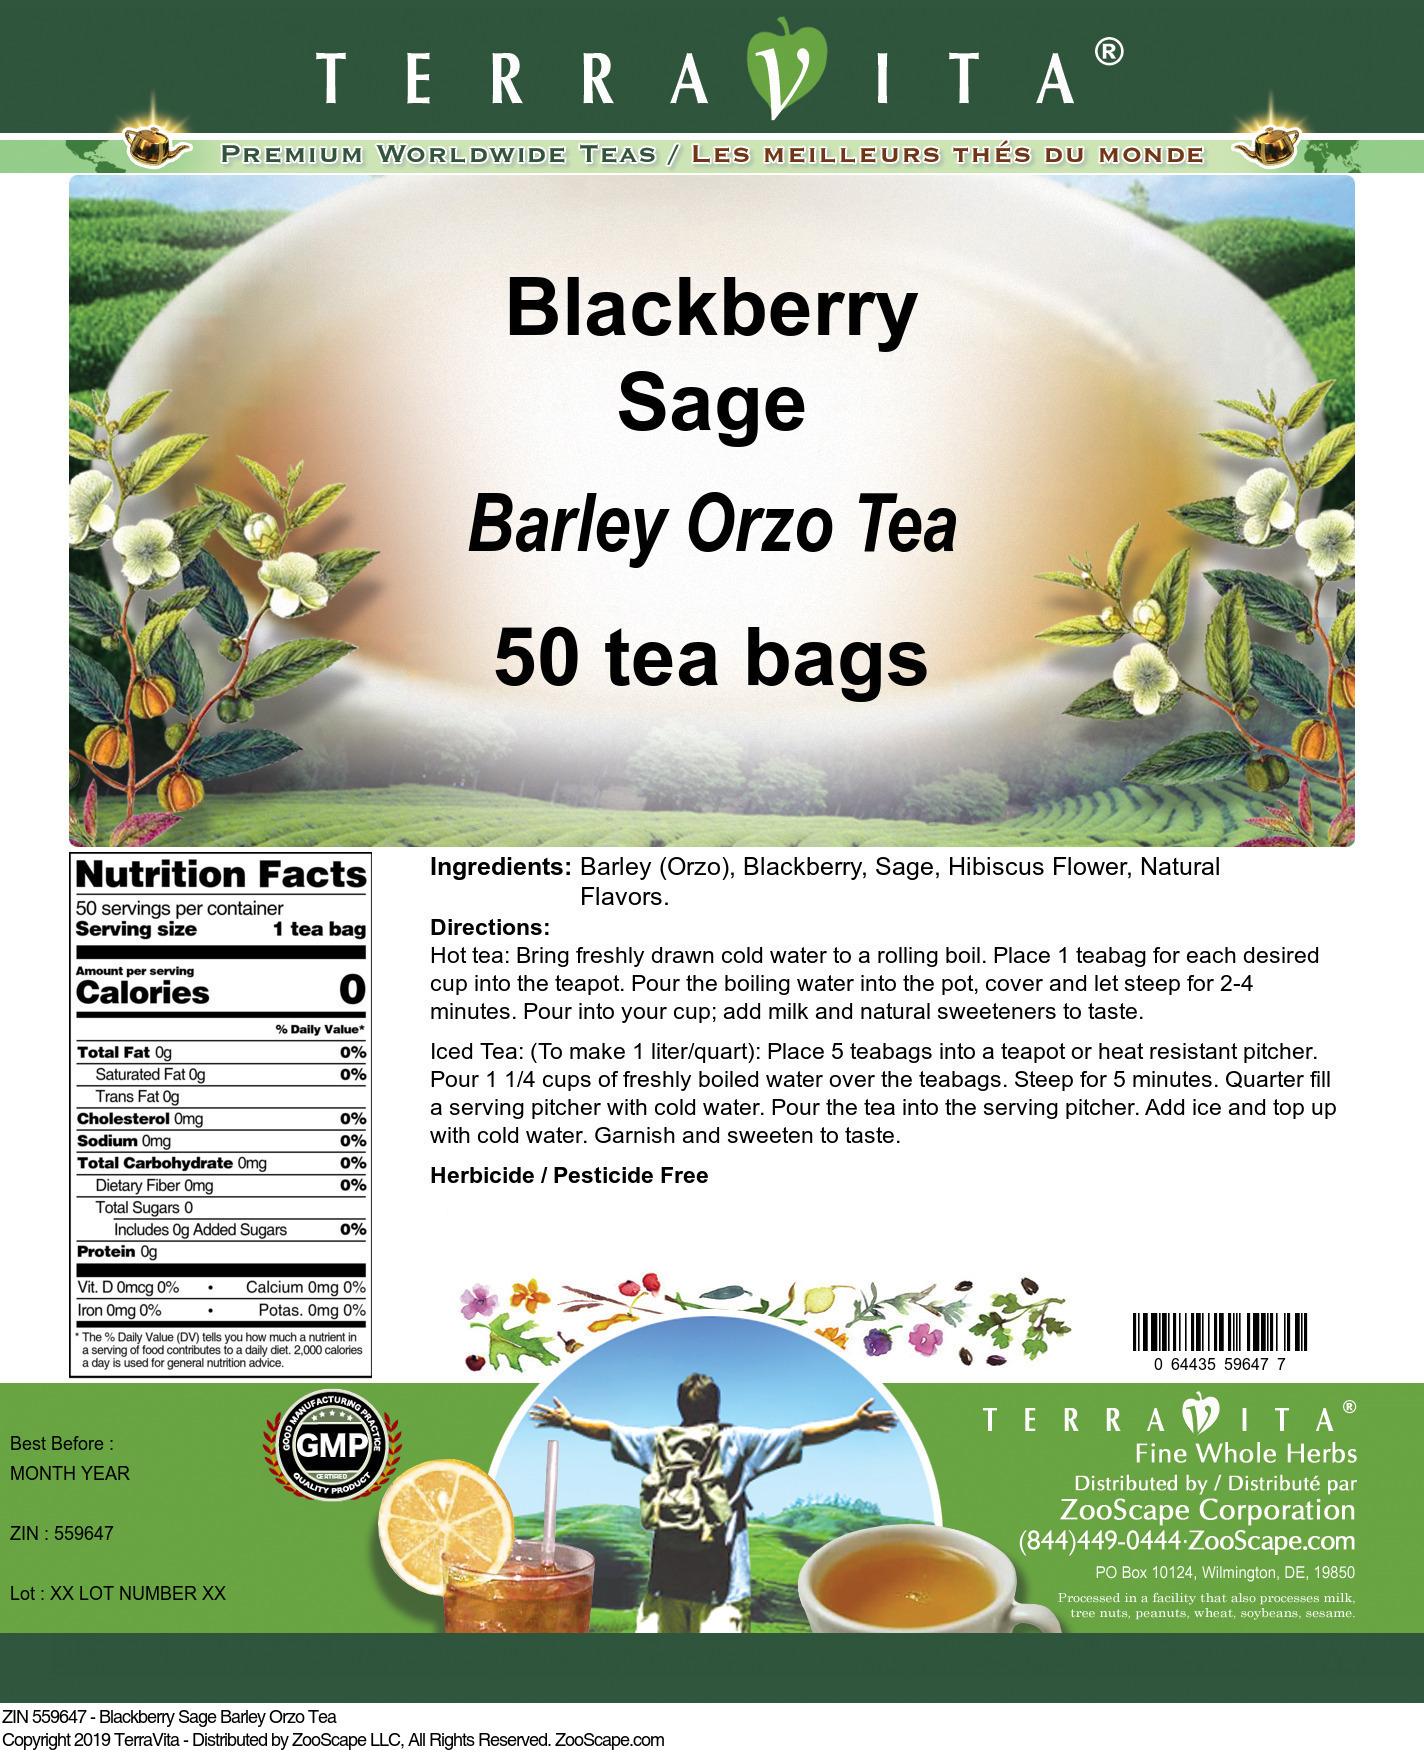 Blackberry Sage Barley Orzo